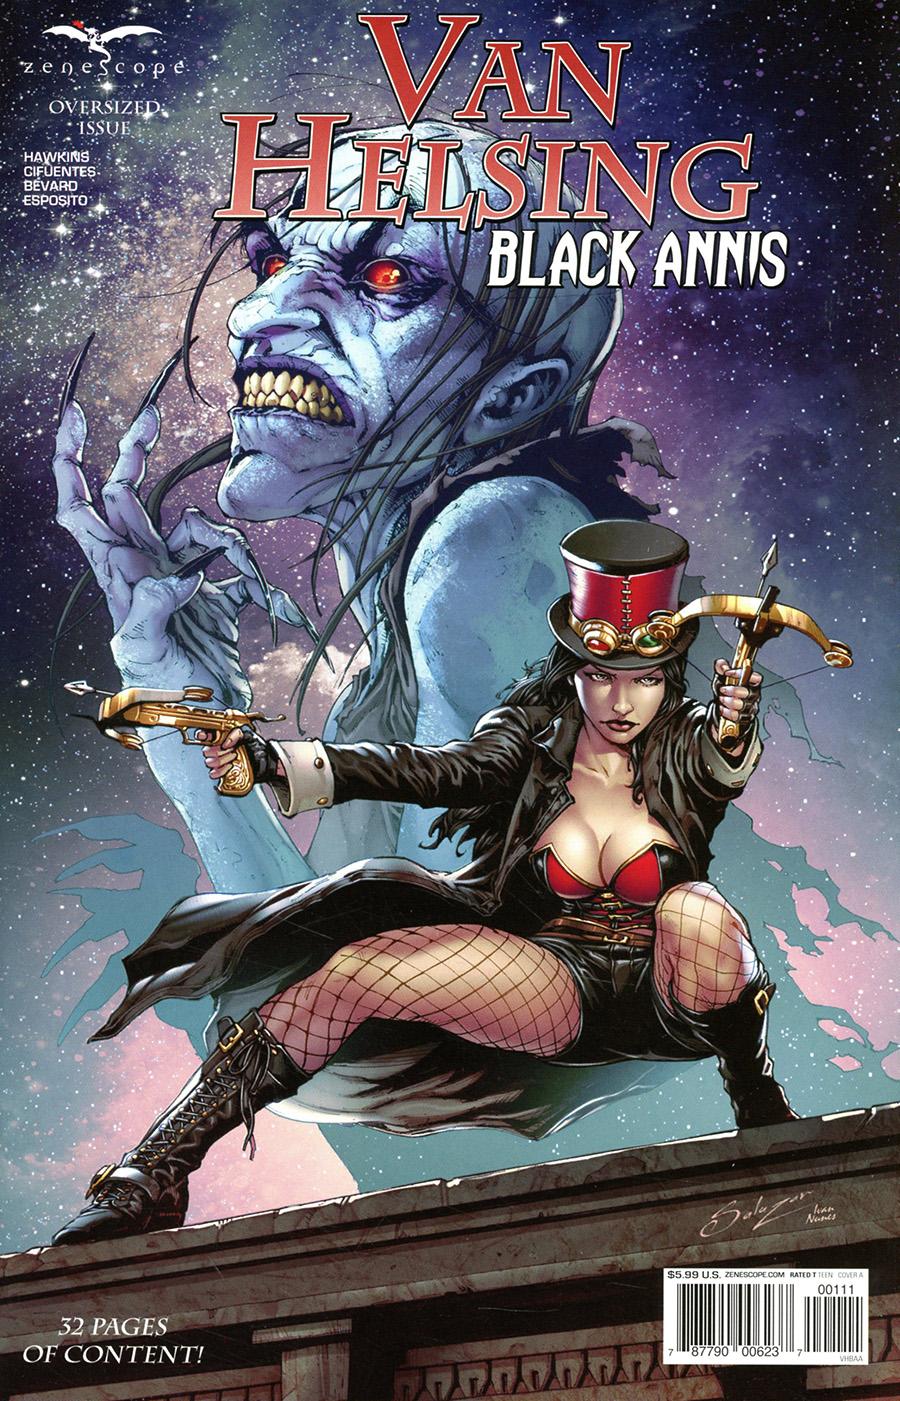 Grimm Fairy Tales Presents Van Helsing Black Annis #1 (One Shot) Cover A Edgar Salazar